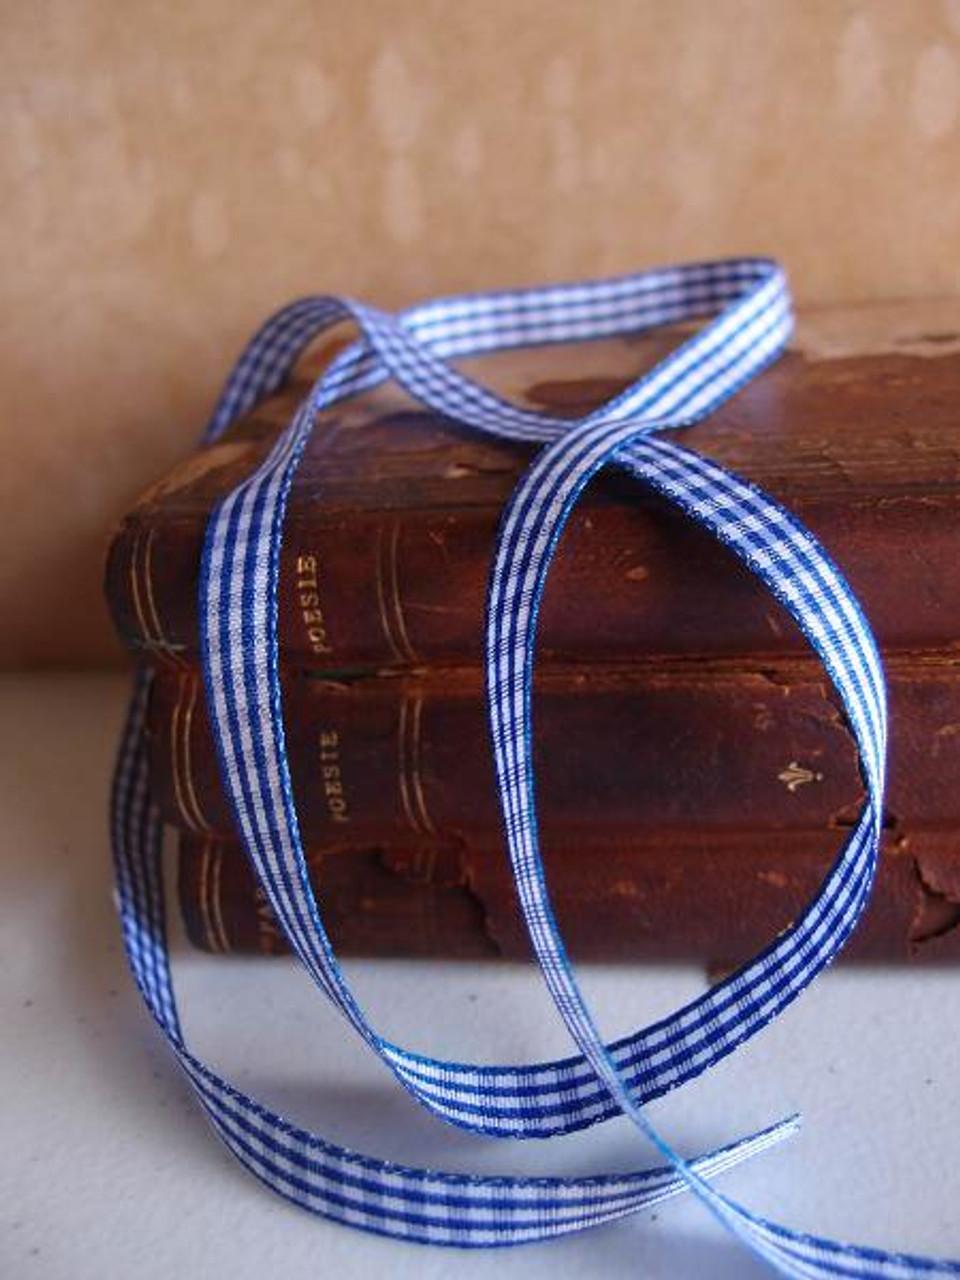 Royal Blue & White Gingham Checkered Ribbon (2 sizes)